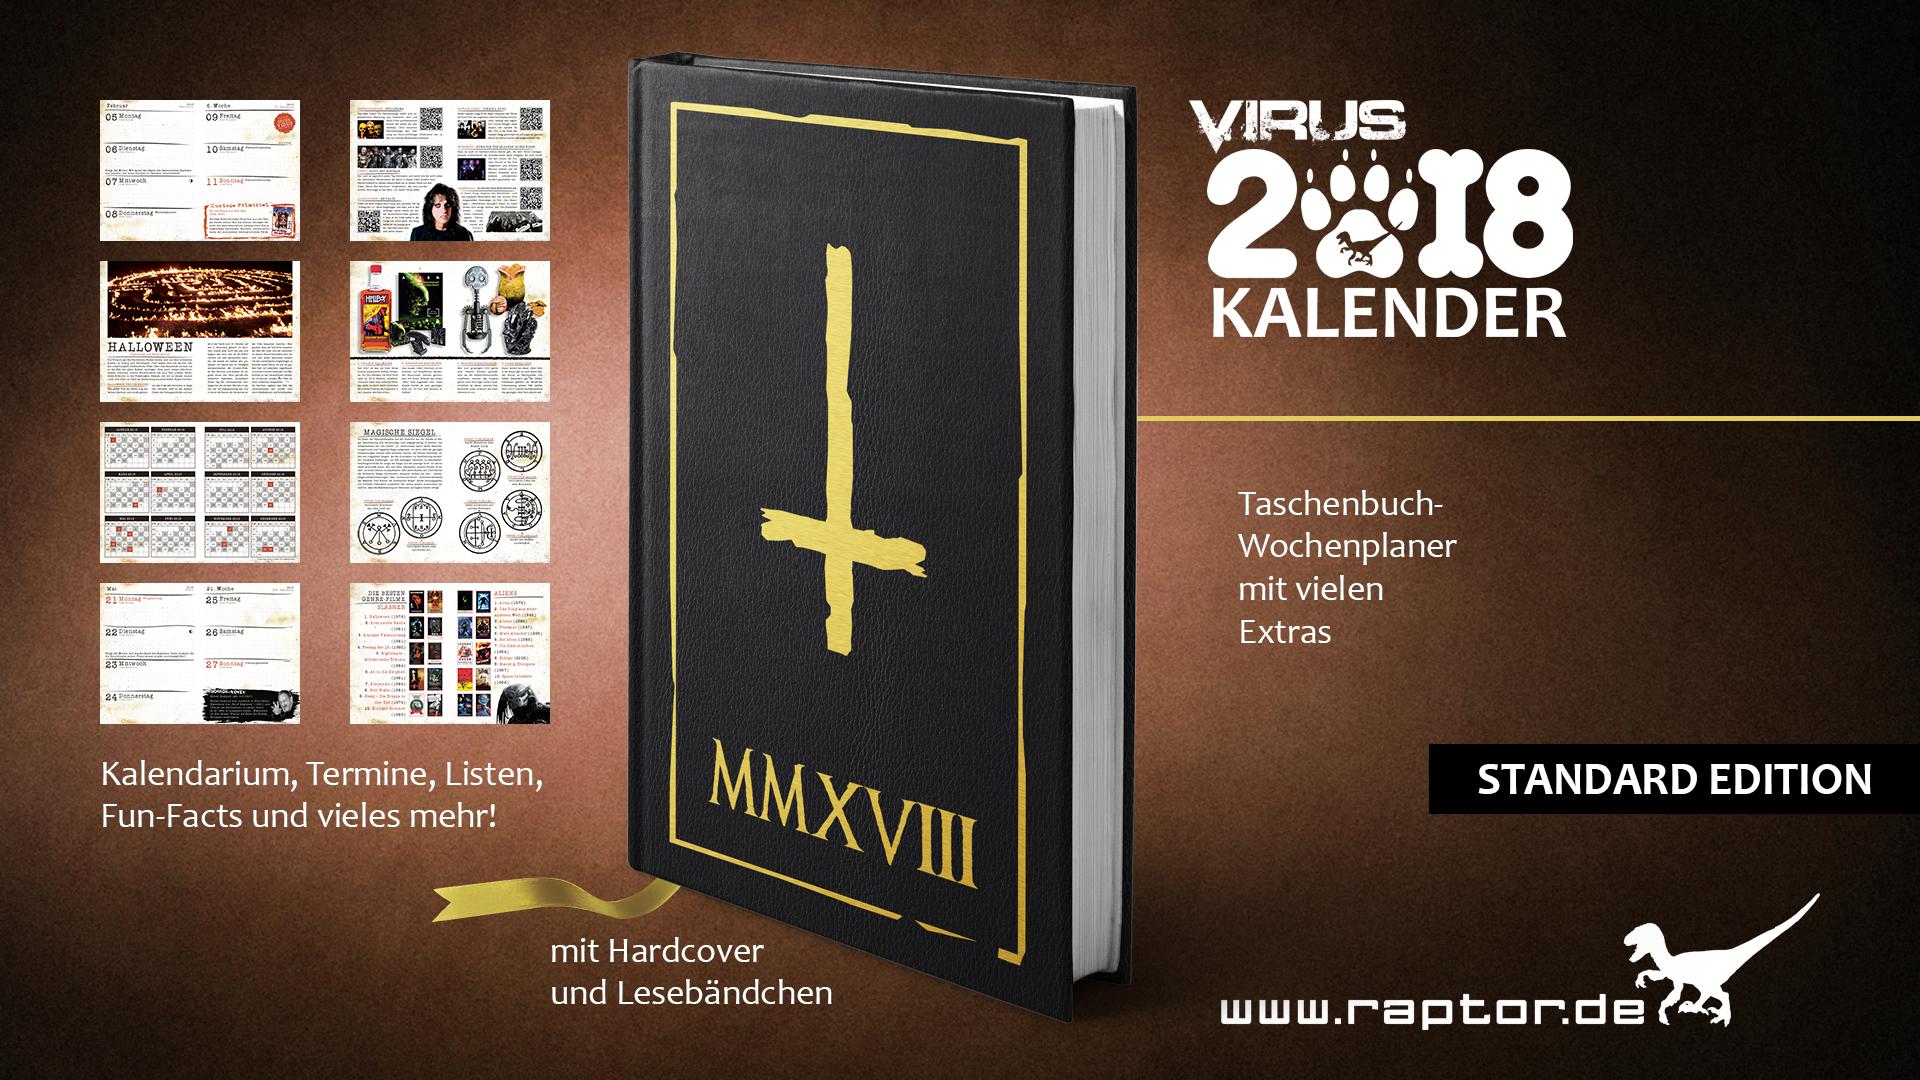 VIRUS Kalender 2018 Standard Edition